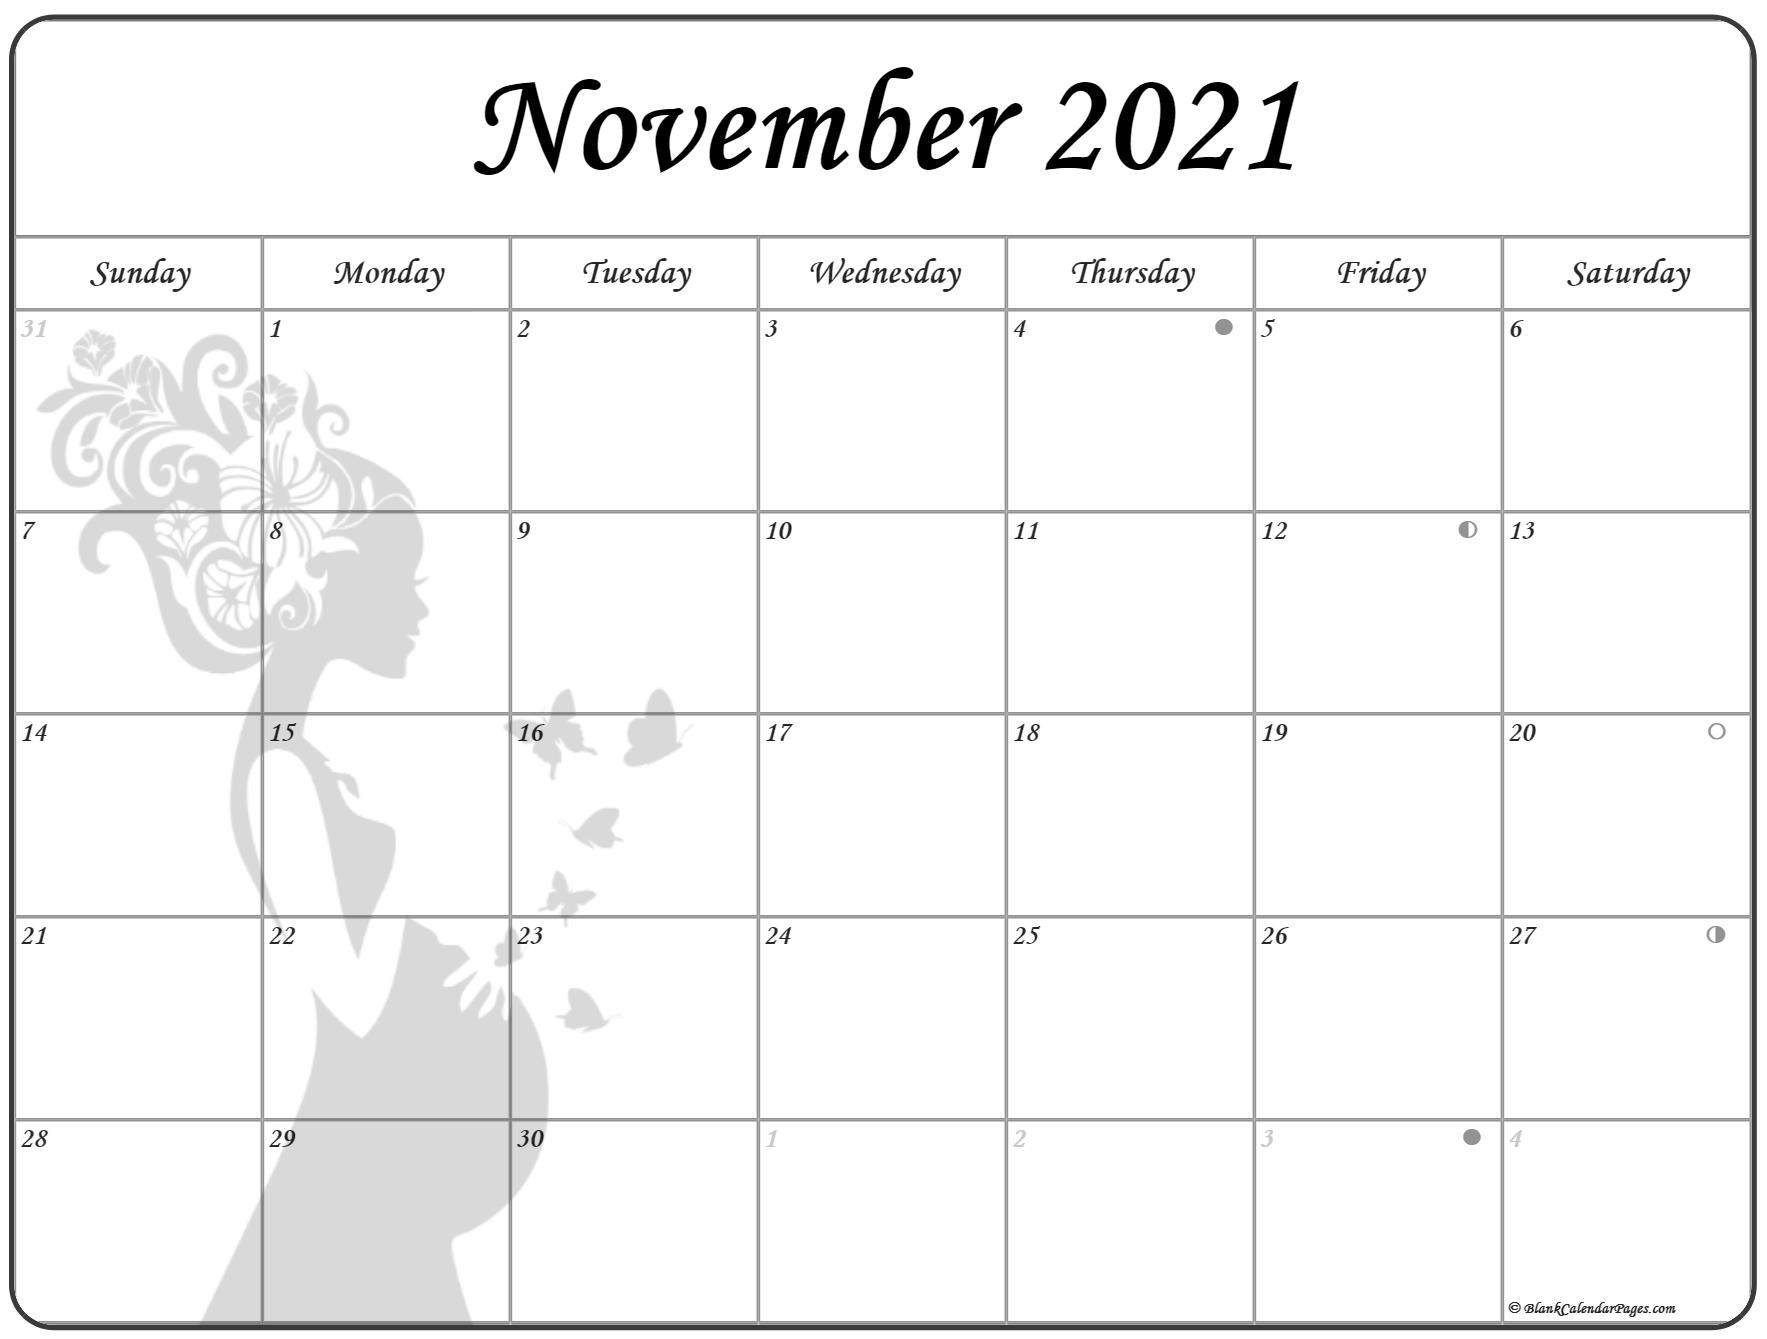 November 2021 Pregnancy Calendar | Fertility Calendar